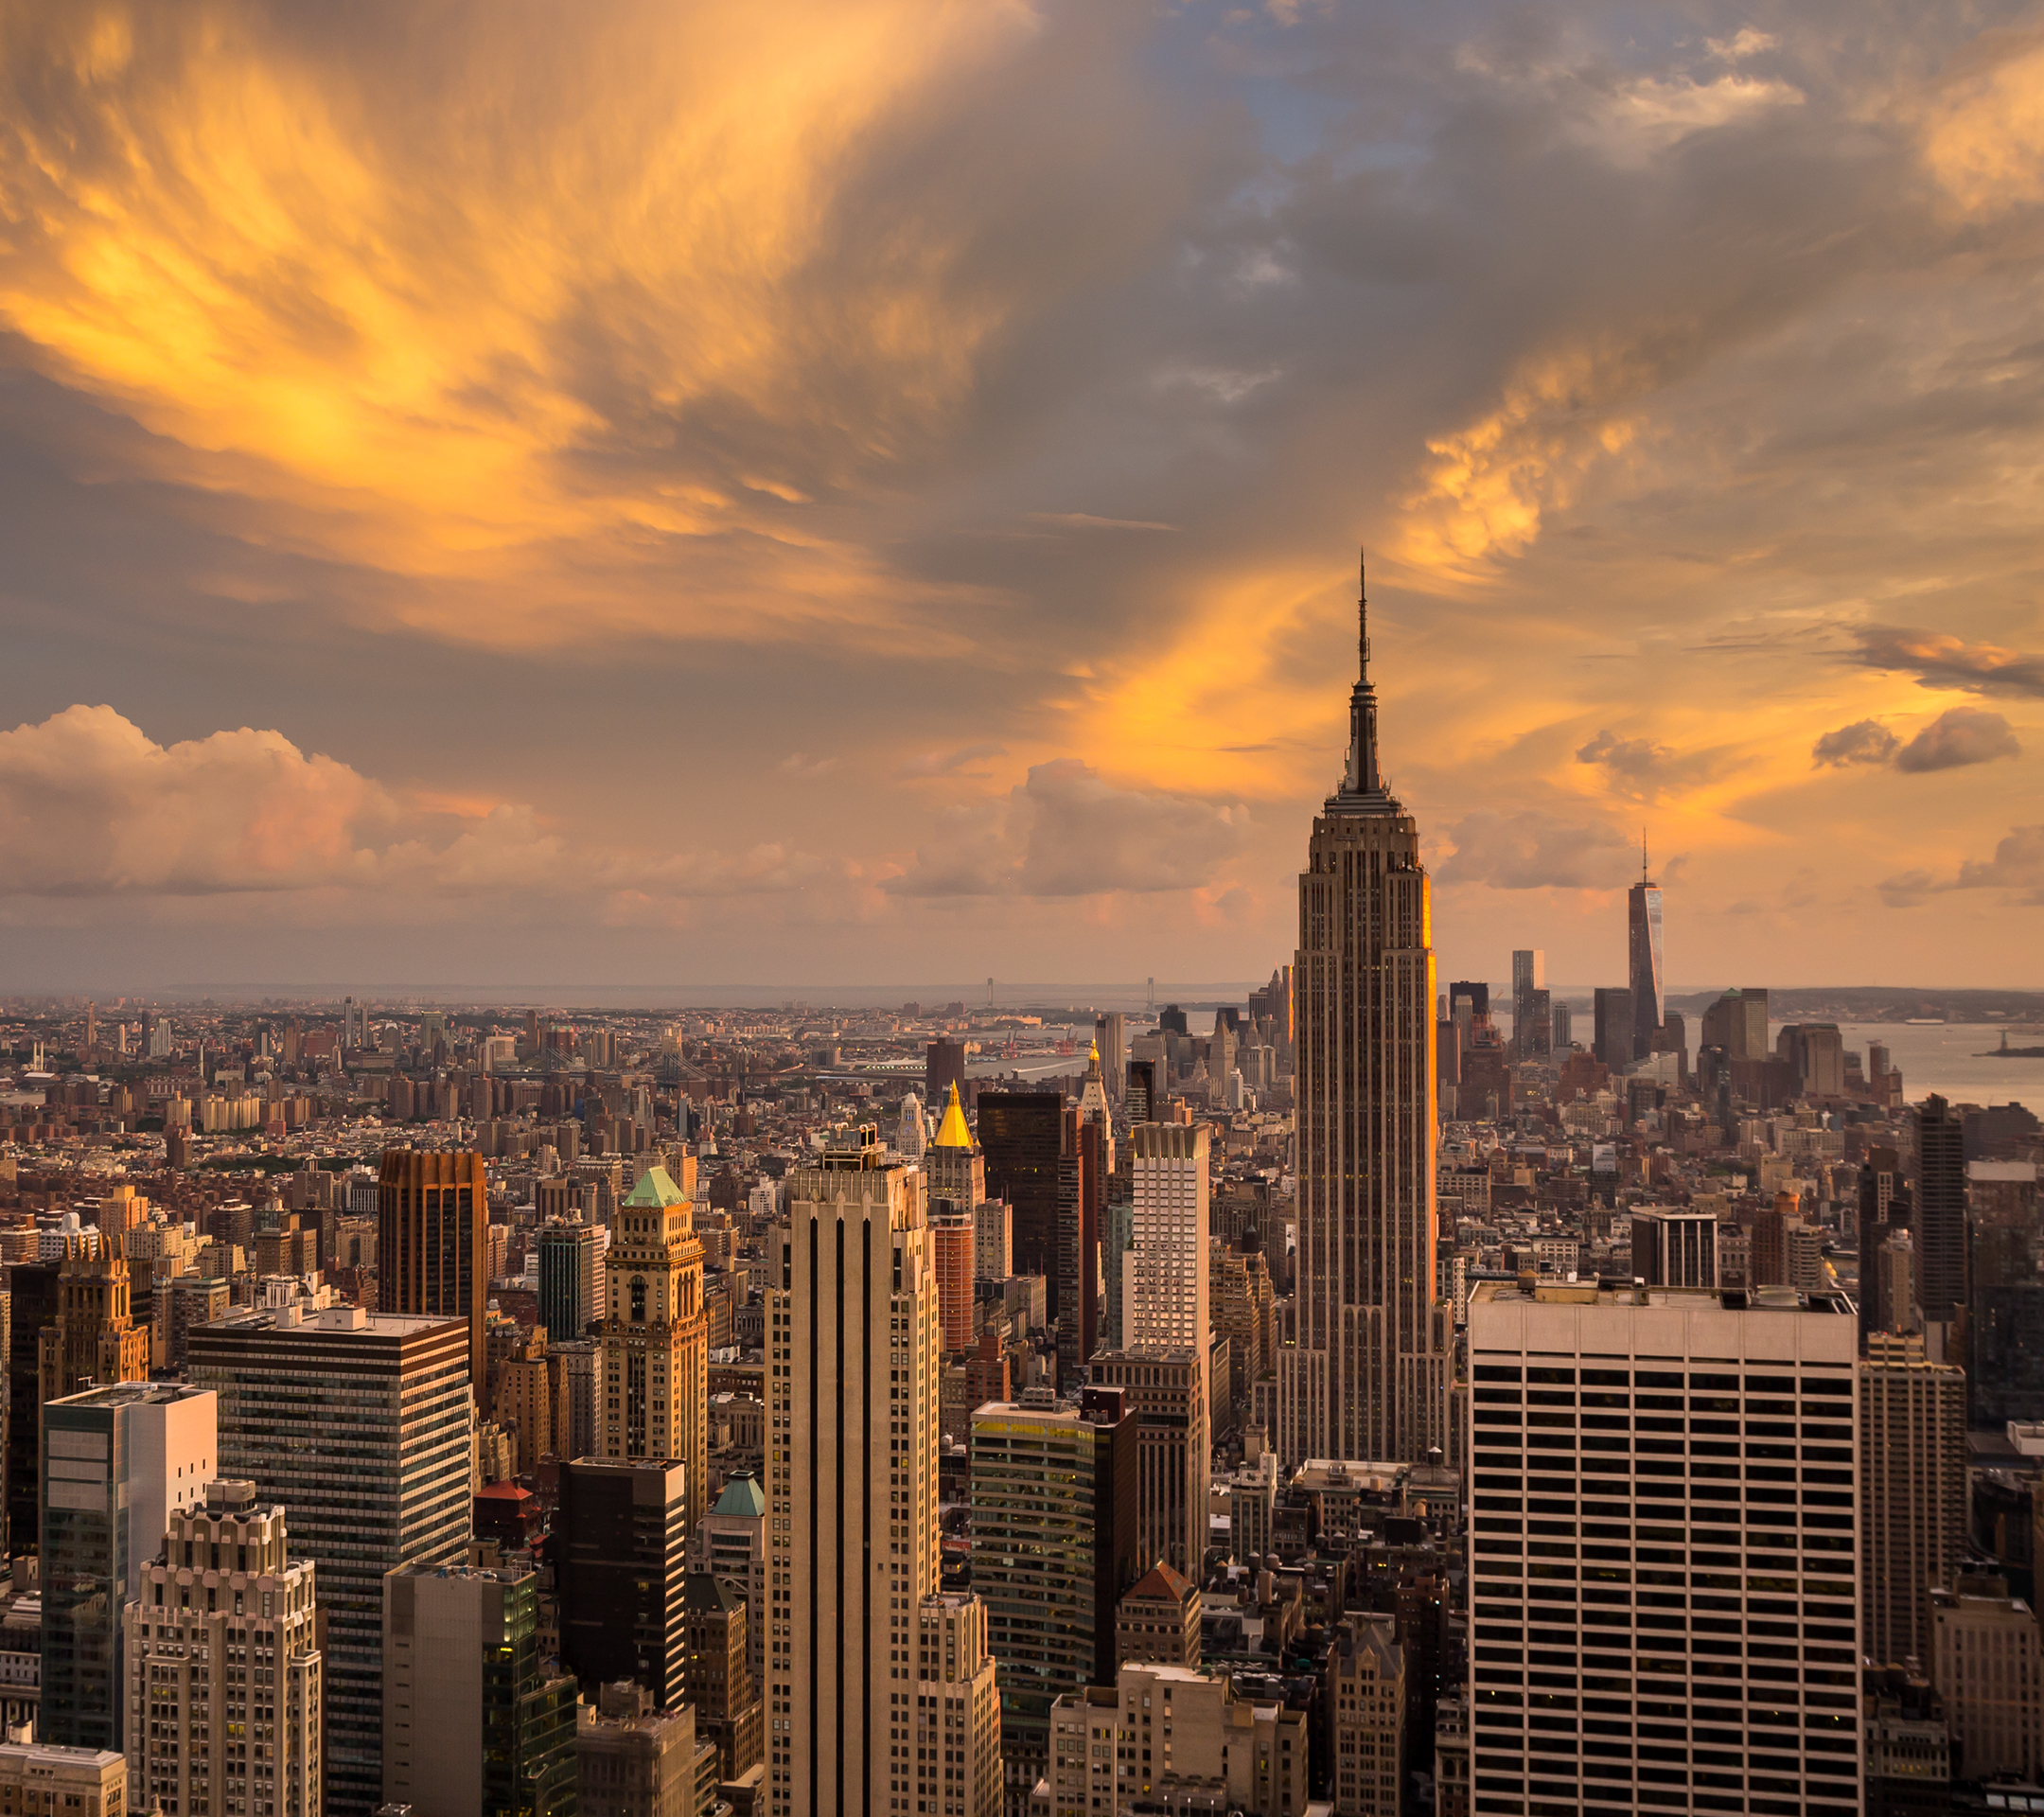 Sunset Over The Manhattan, New York Wallpaper Download